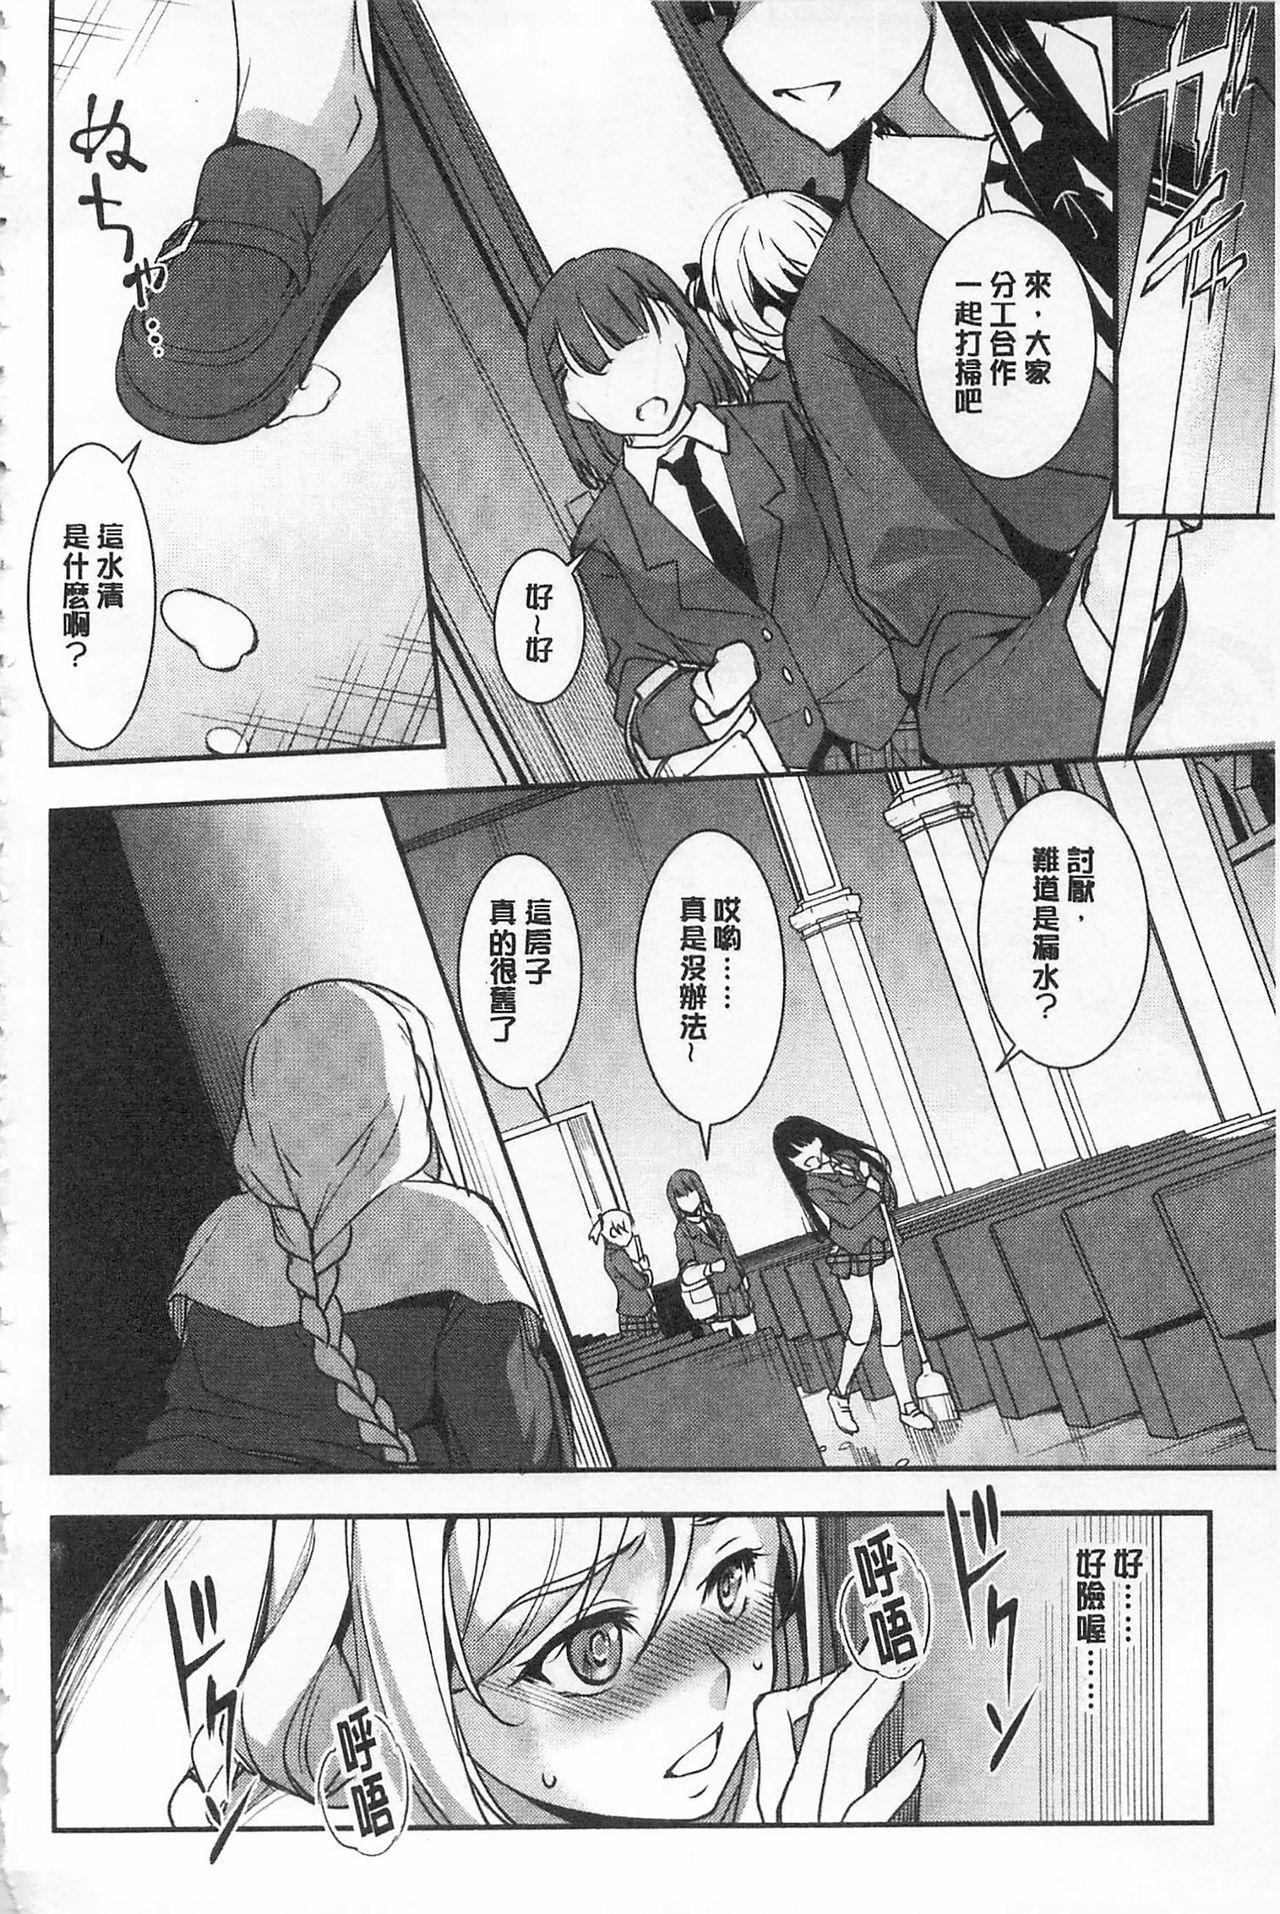 [Amano Kazumi] Seida Inyou -Seijo no Katachi Shita Intou- | 聖墮陰陽 -聖女的容貌與淫蕩- [Chinese] 75